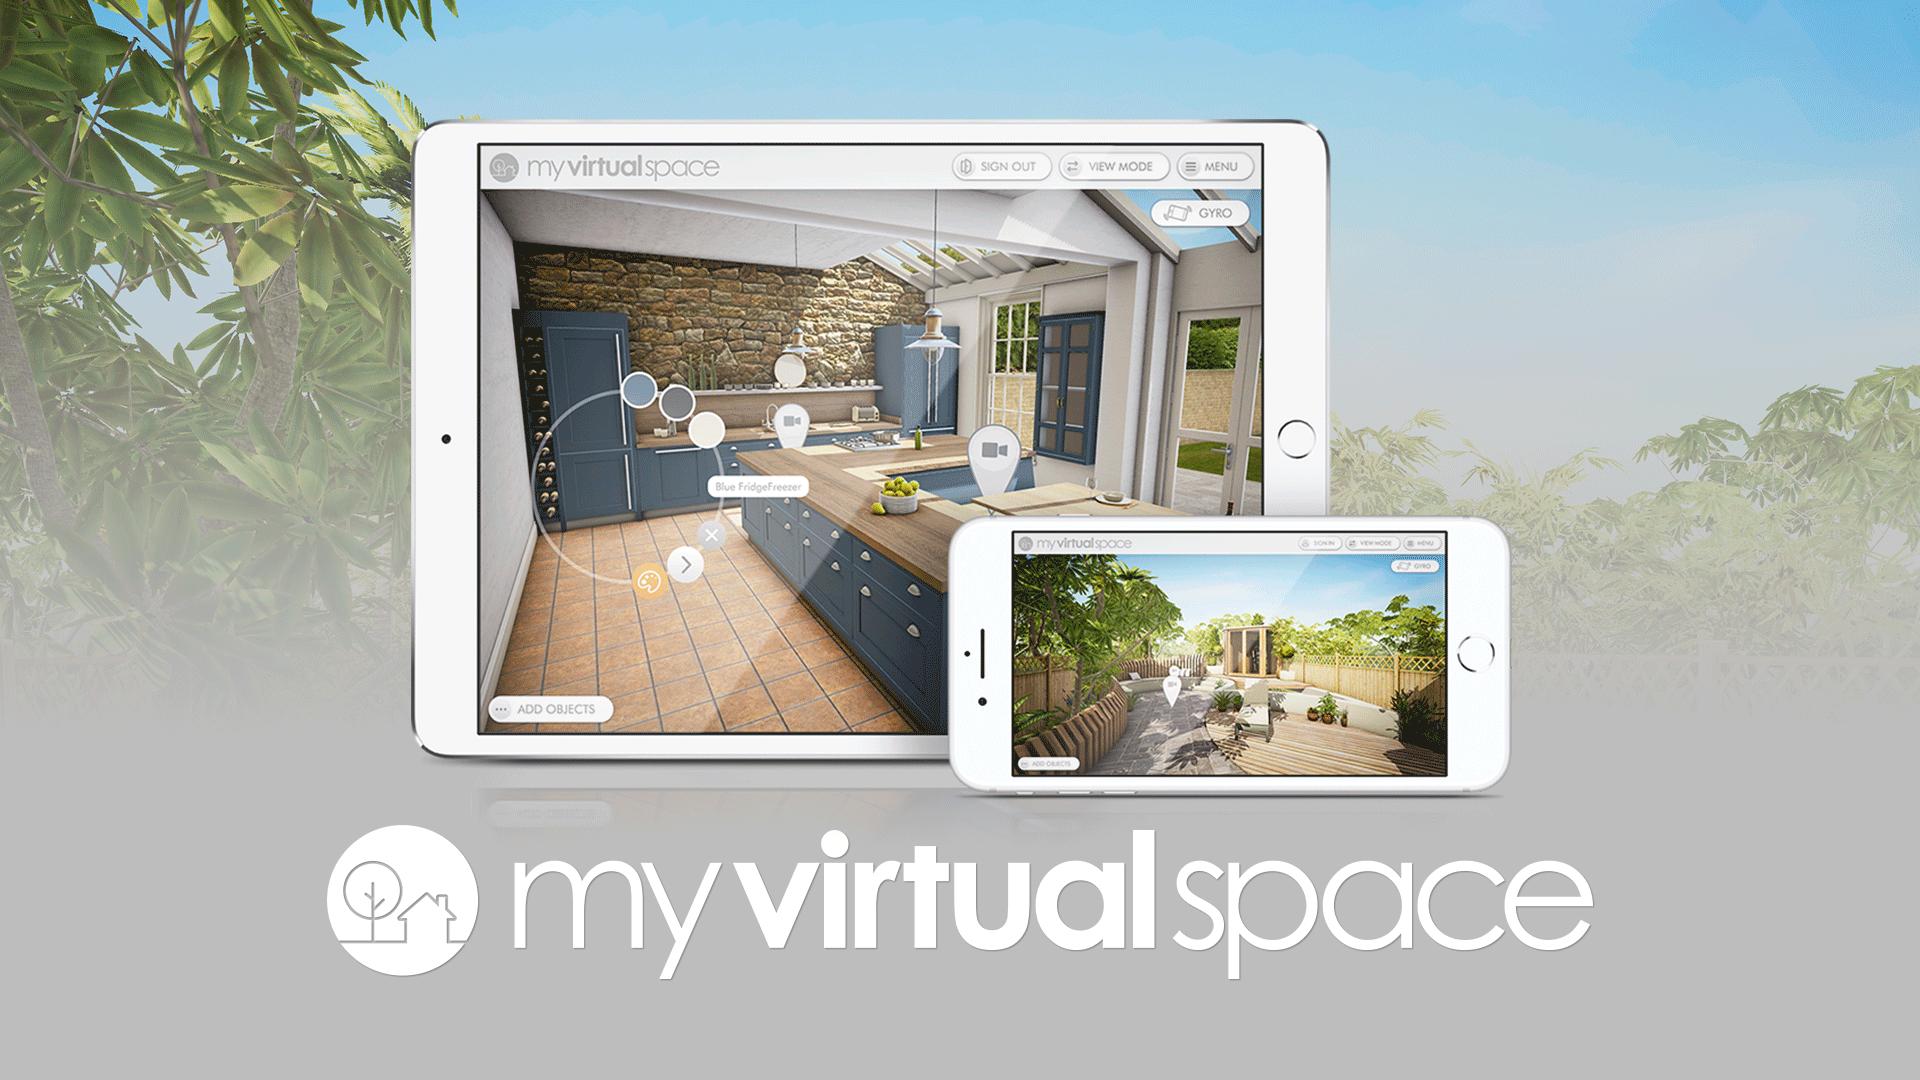 My Virtual Space